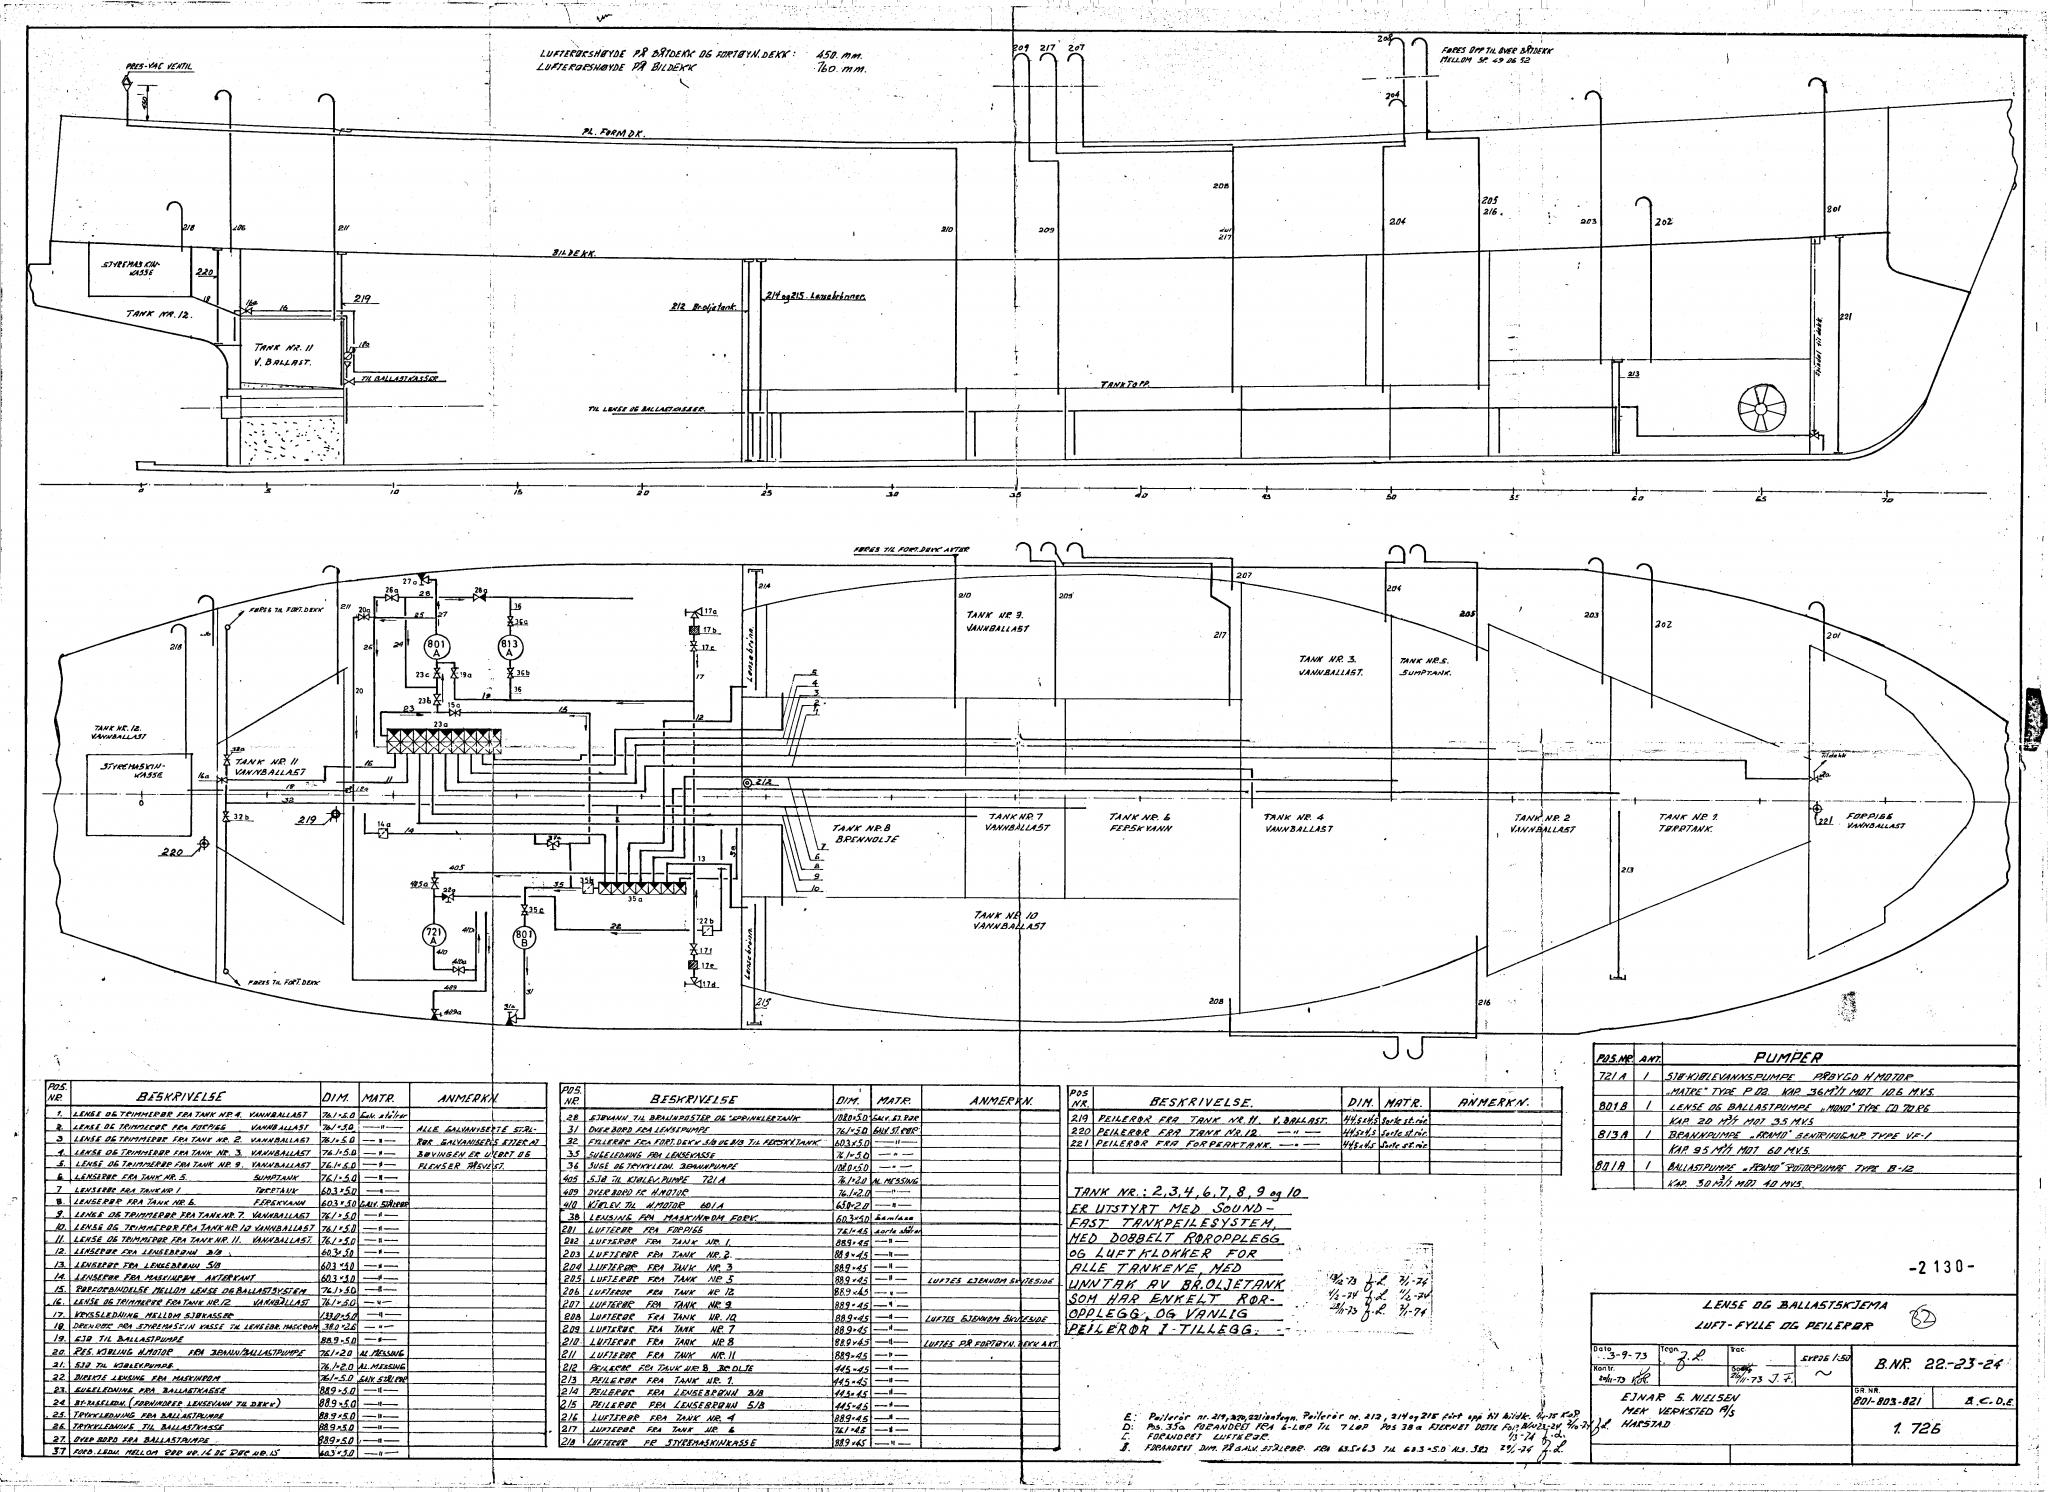 Plumbing, Ballast Tanks Layout, Original - Lense de Ballastskejema - 007